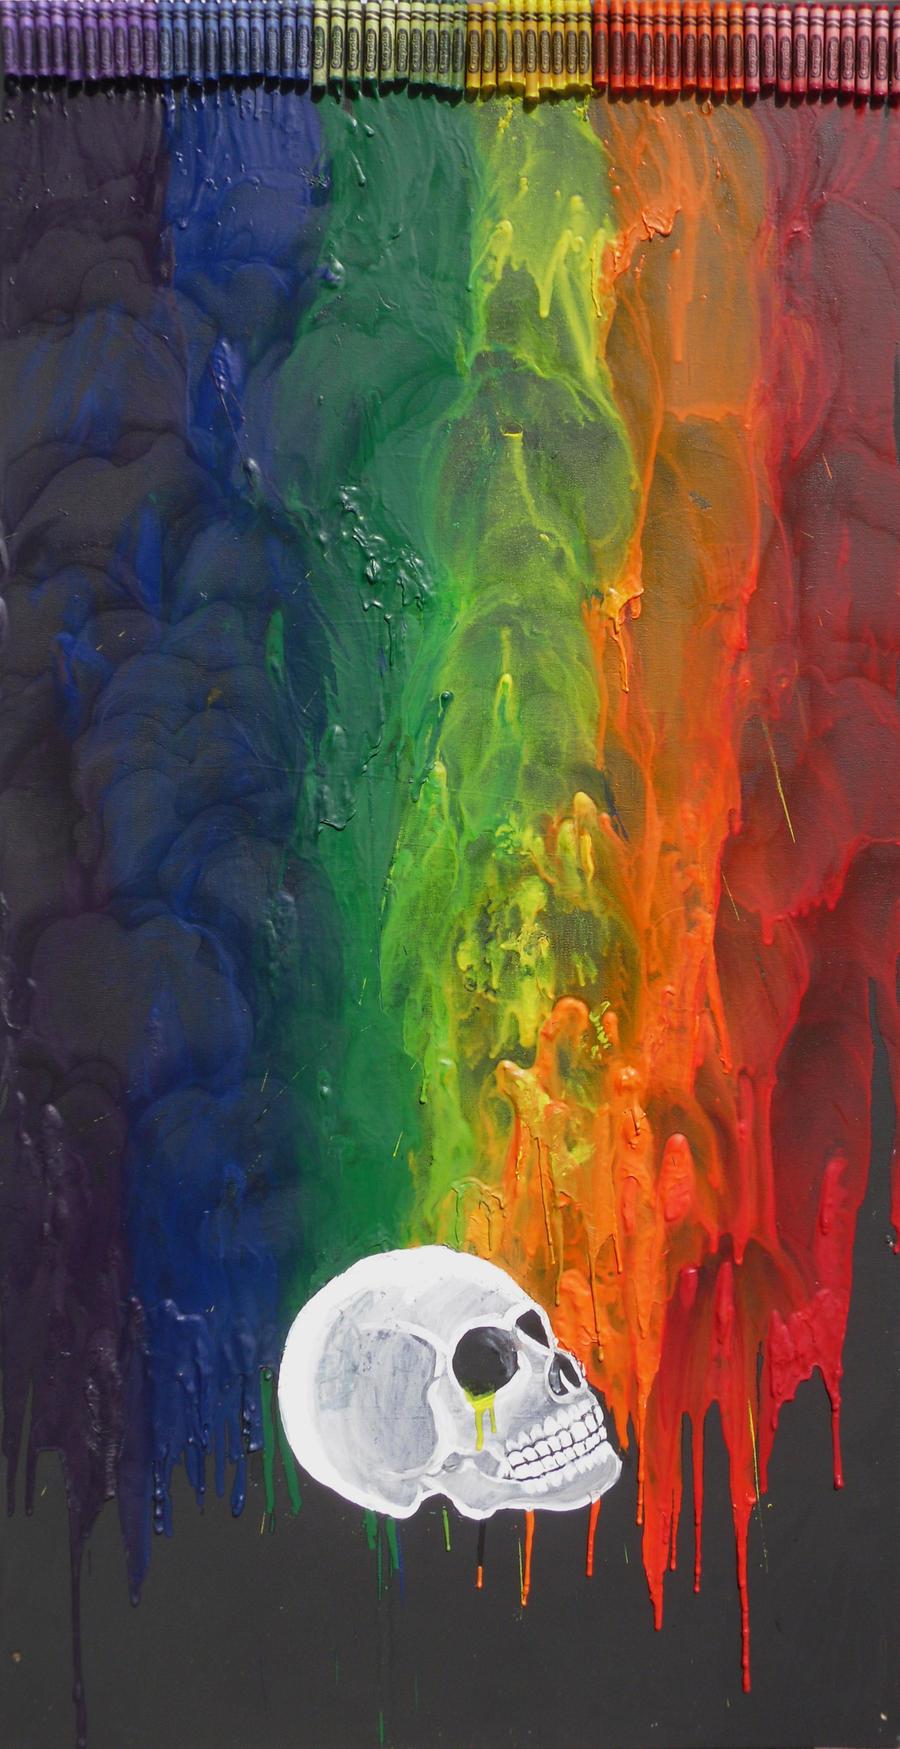 Crayon Art - Rainbow Skull by randomranma